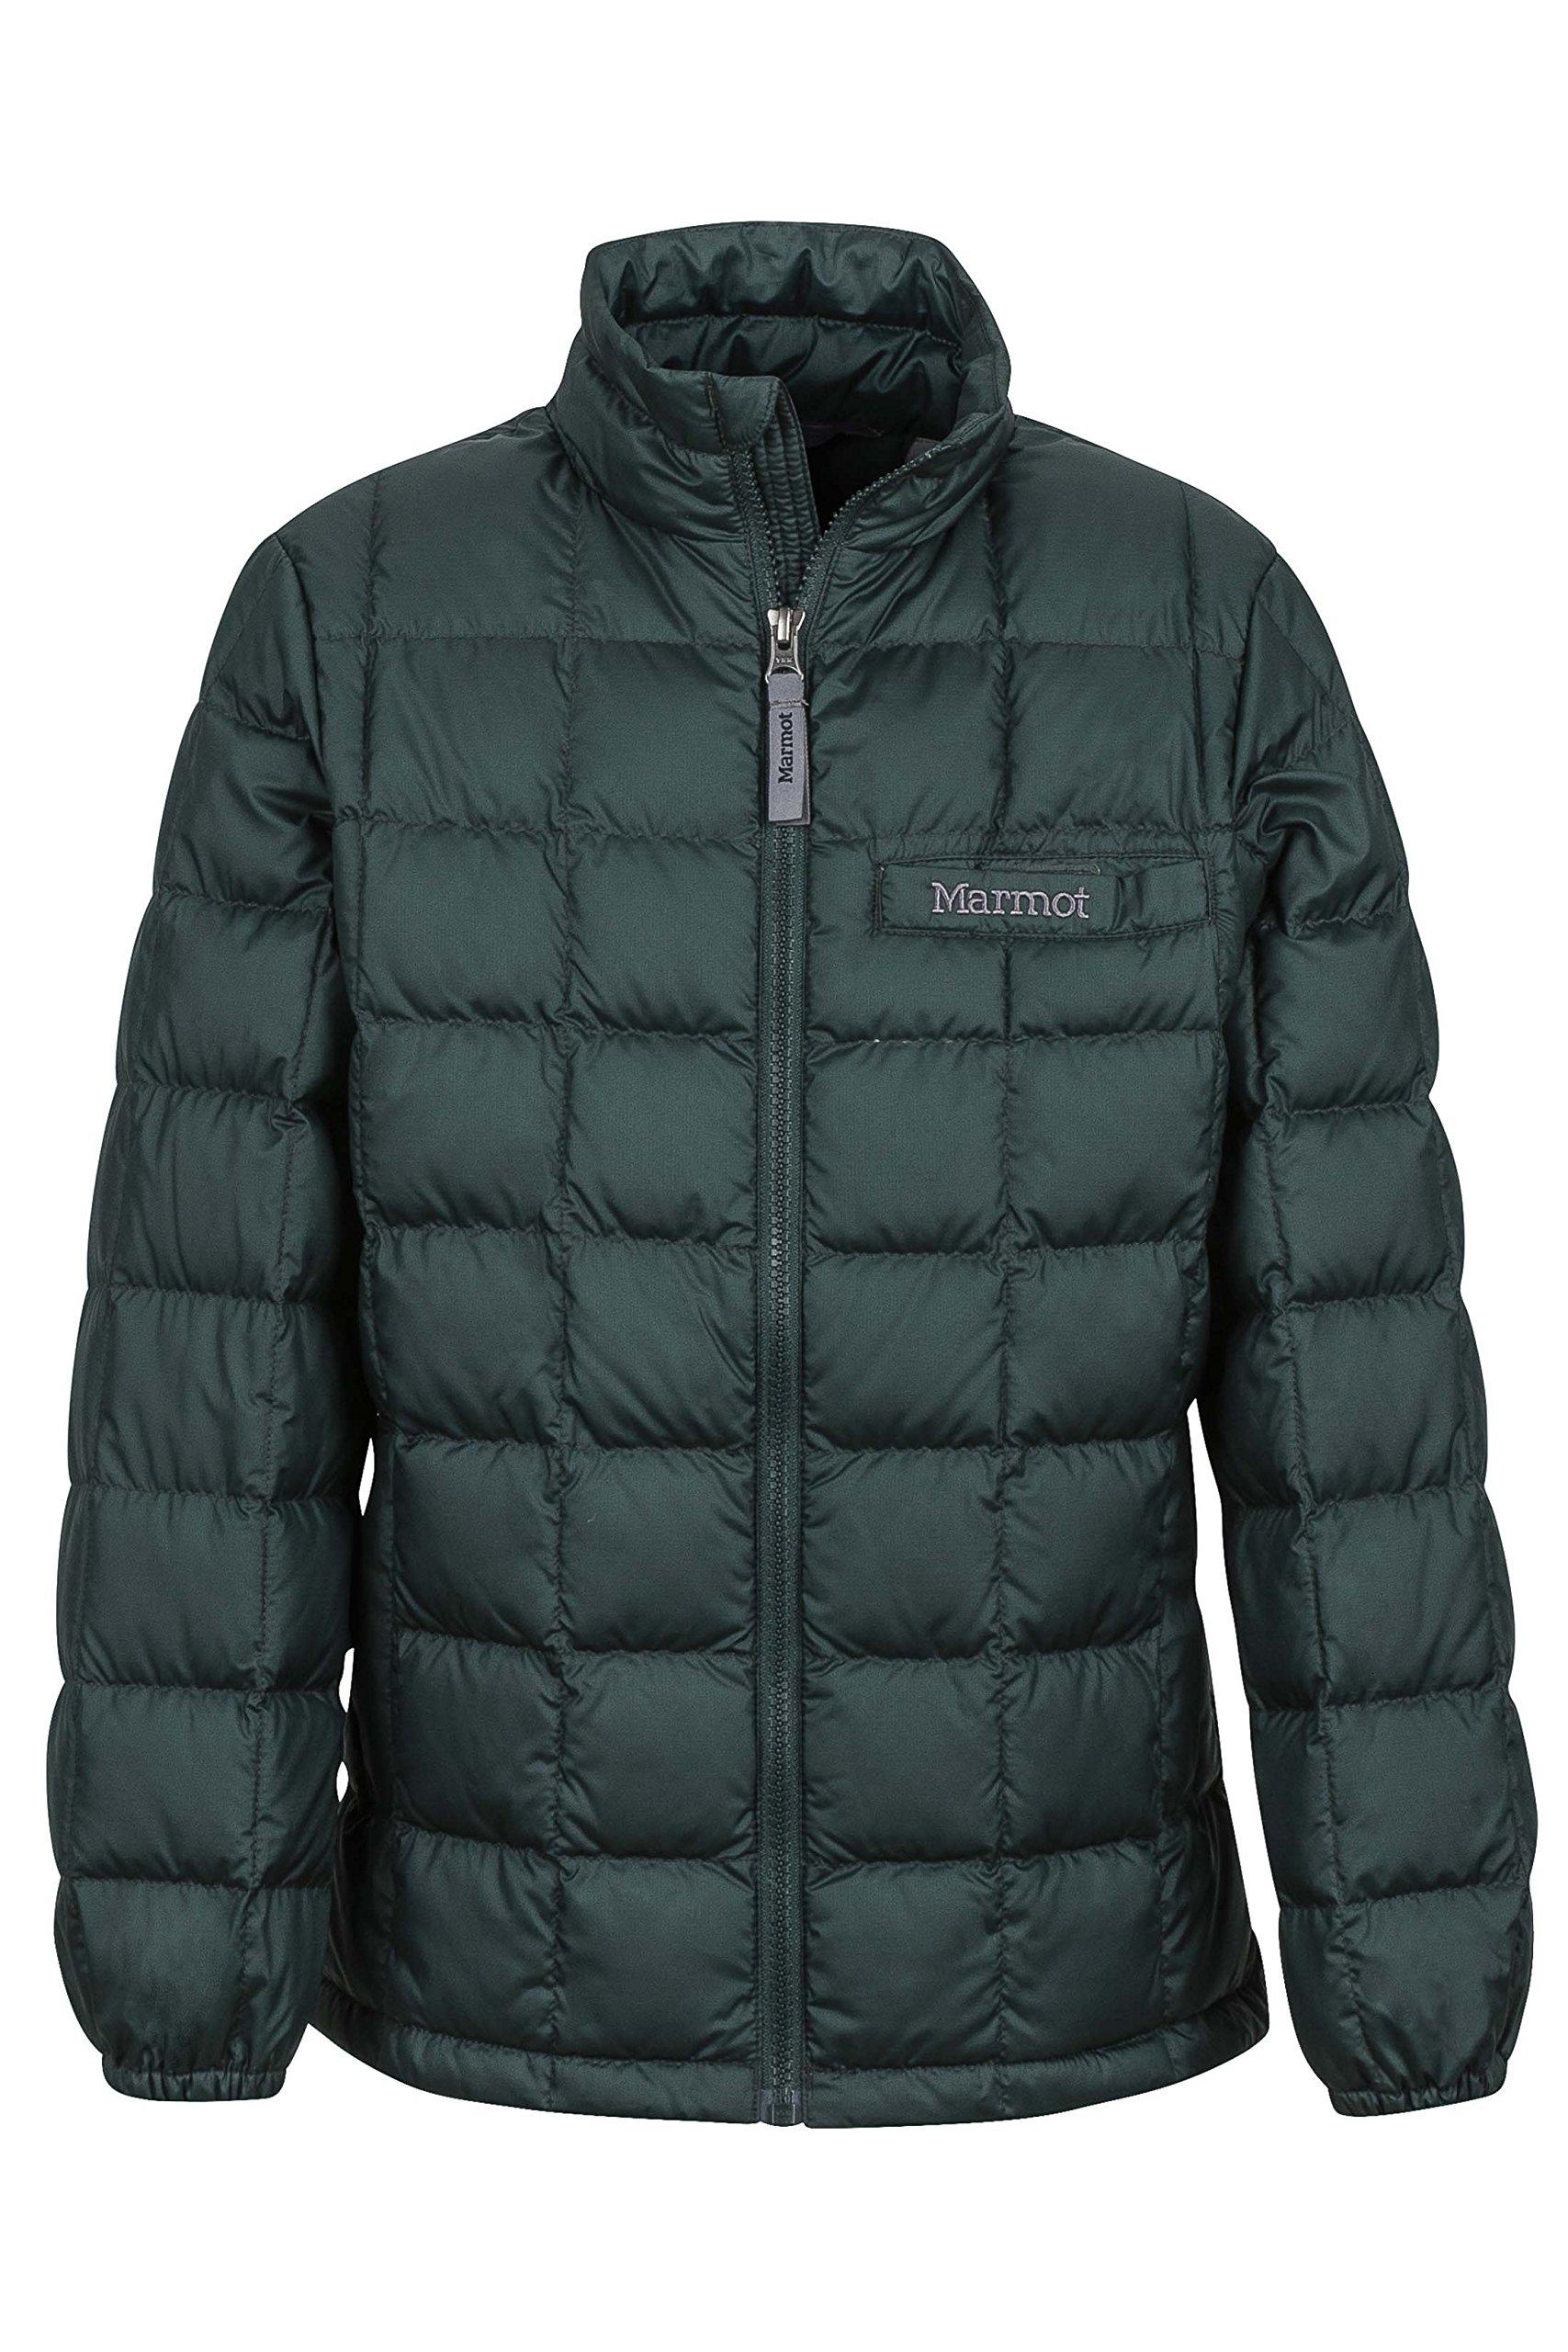 Marmot Ajax Boys' Down Puffer Jacket, Fill Power 600, Dark Spruce, X-Large